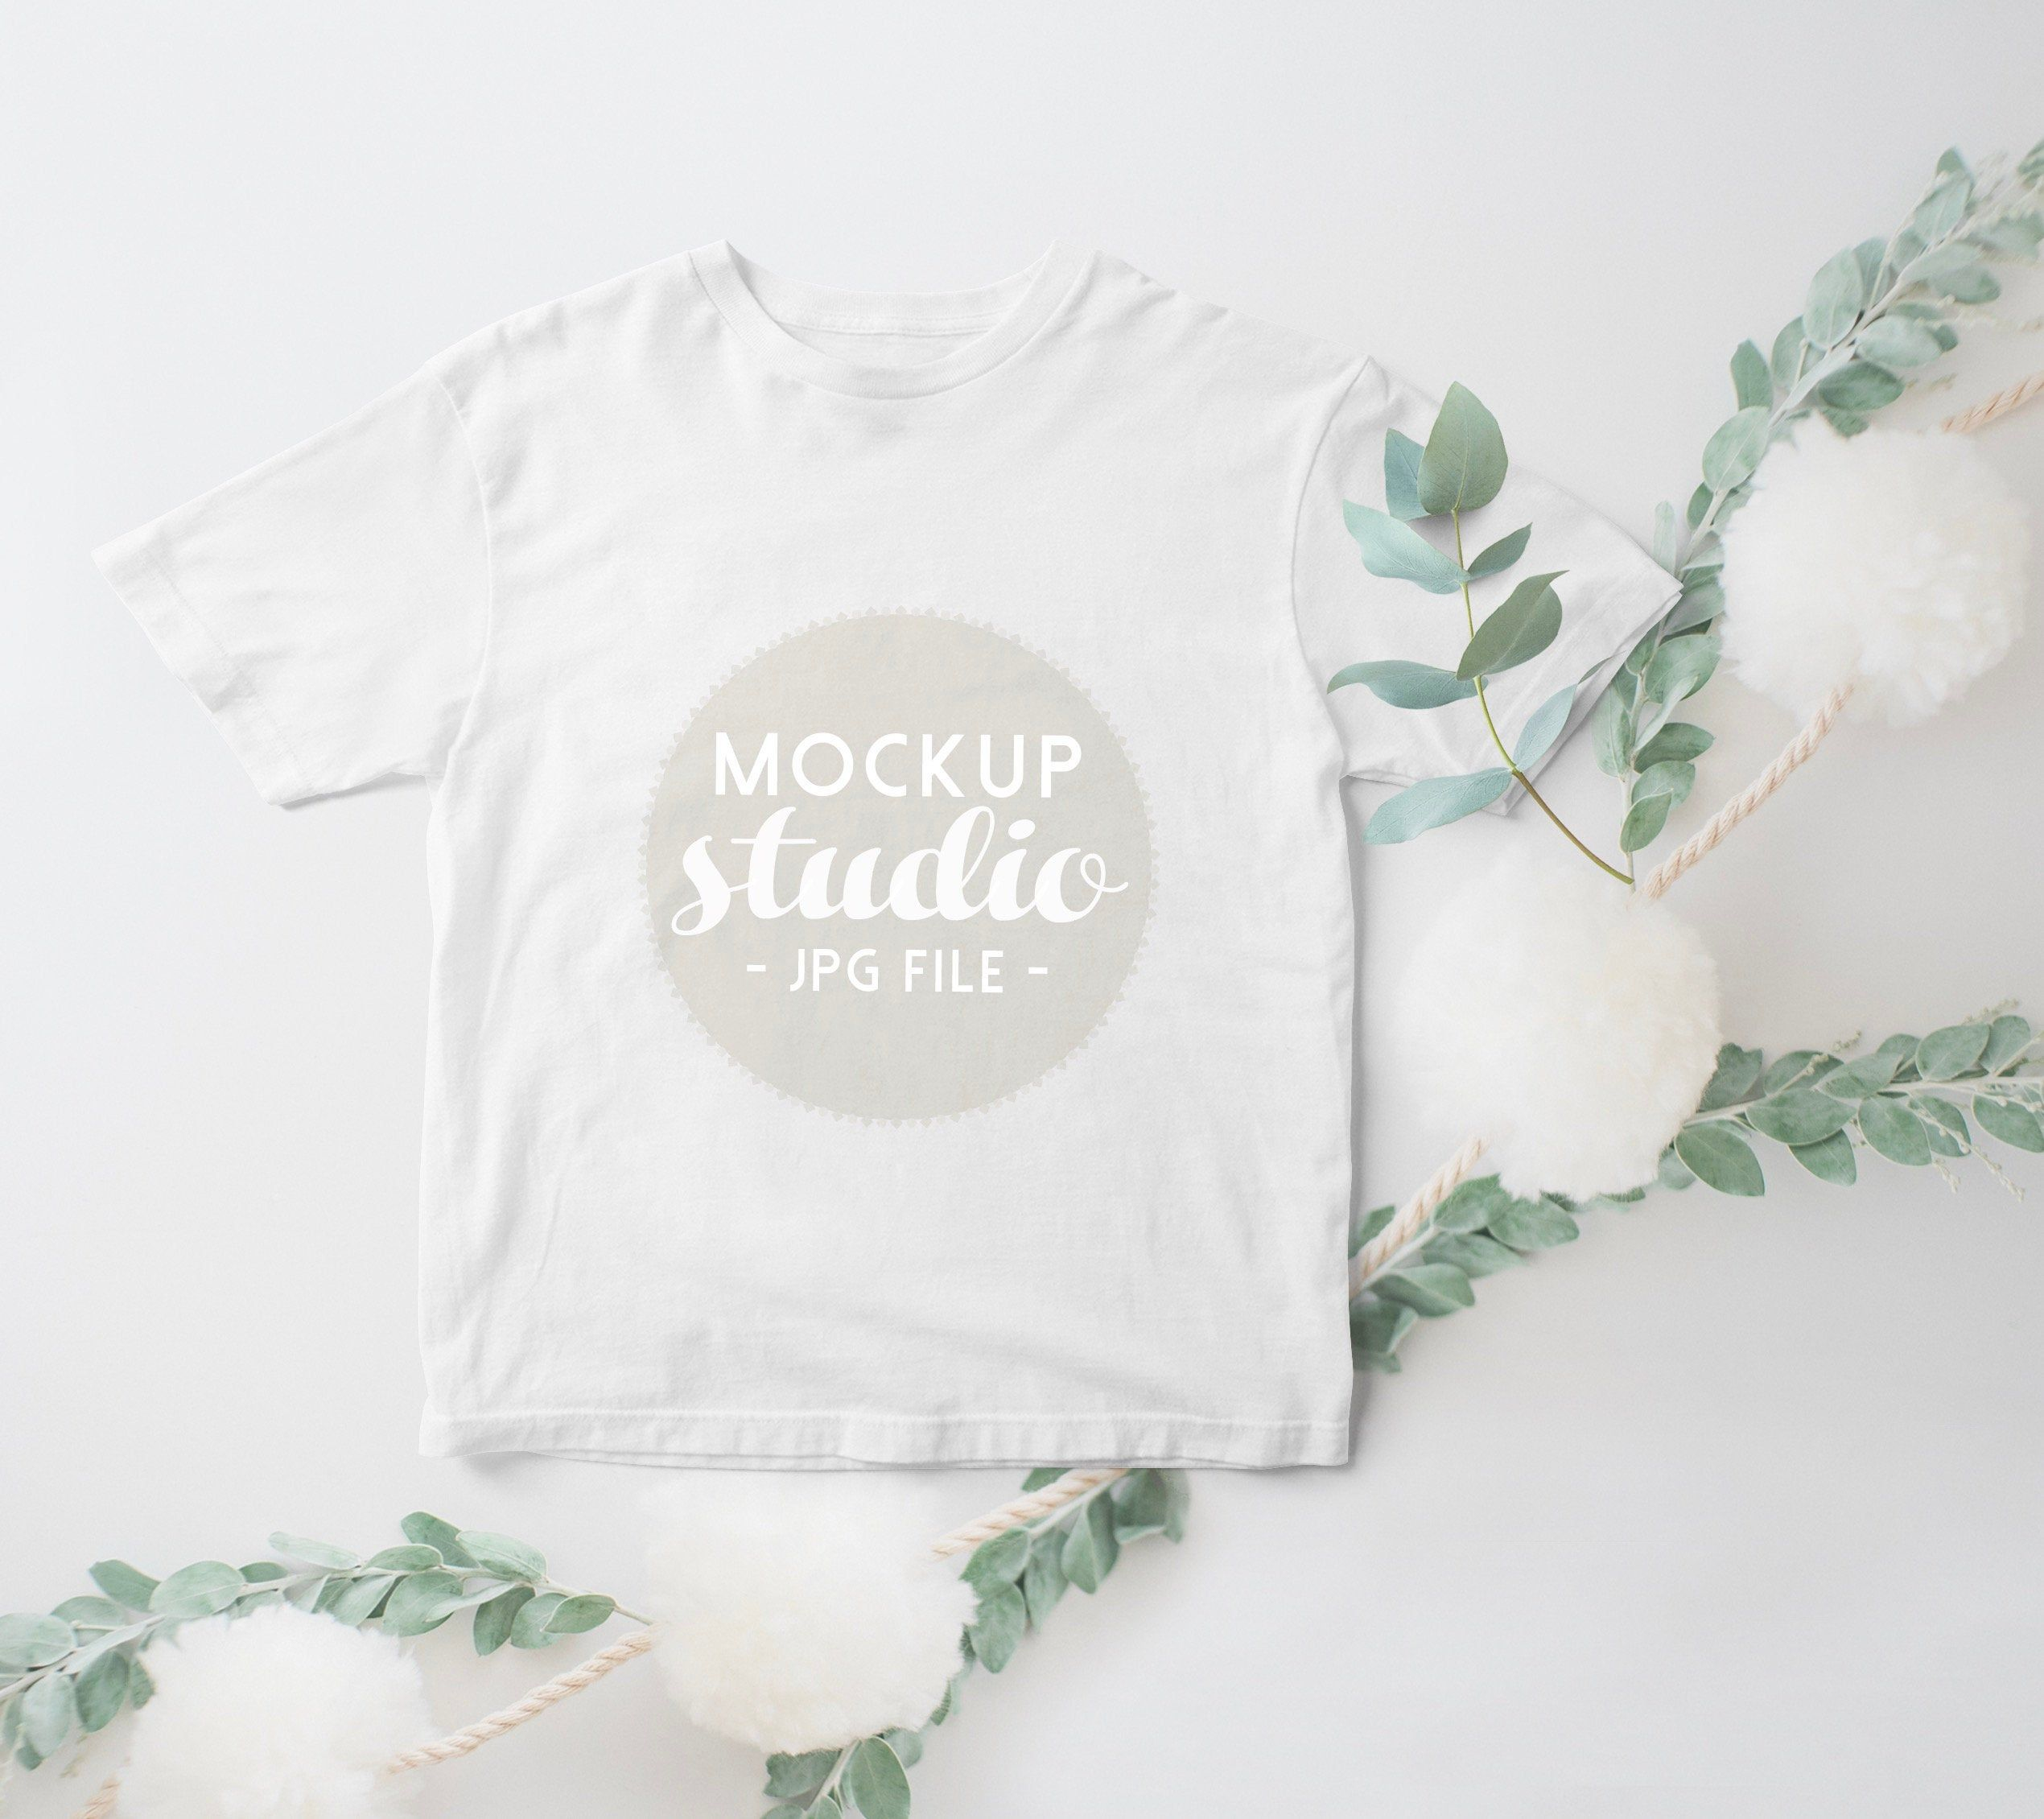 Download T Shirt Mockup Kids Baby Mockup Delicate White Tee Mockup Etsy Clothing Mockup Frame Mockup Free White Tees